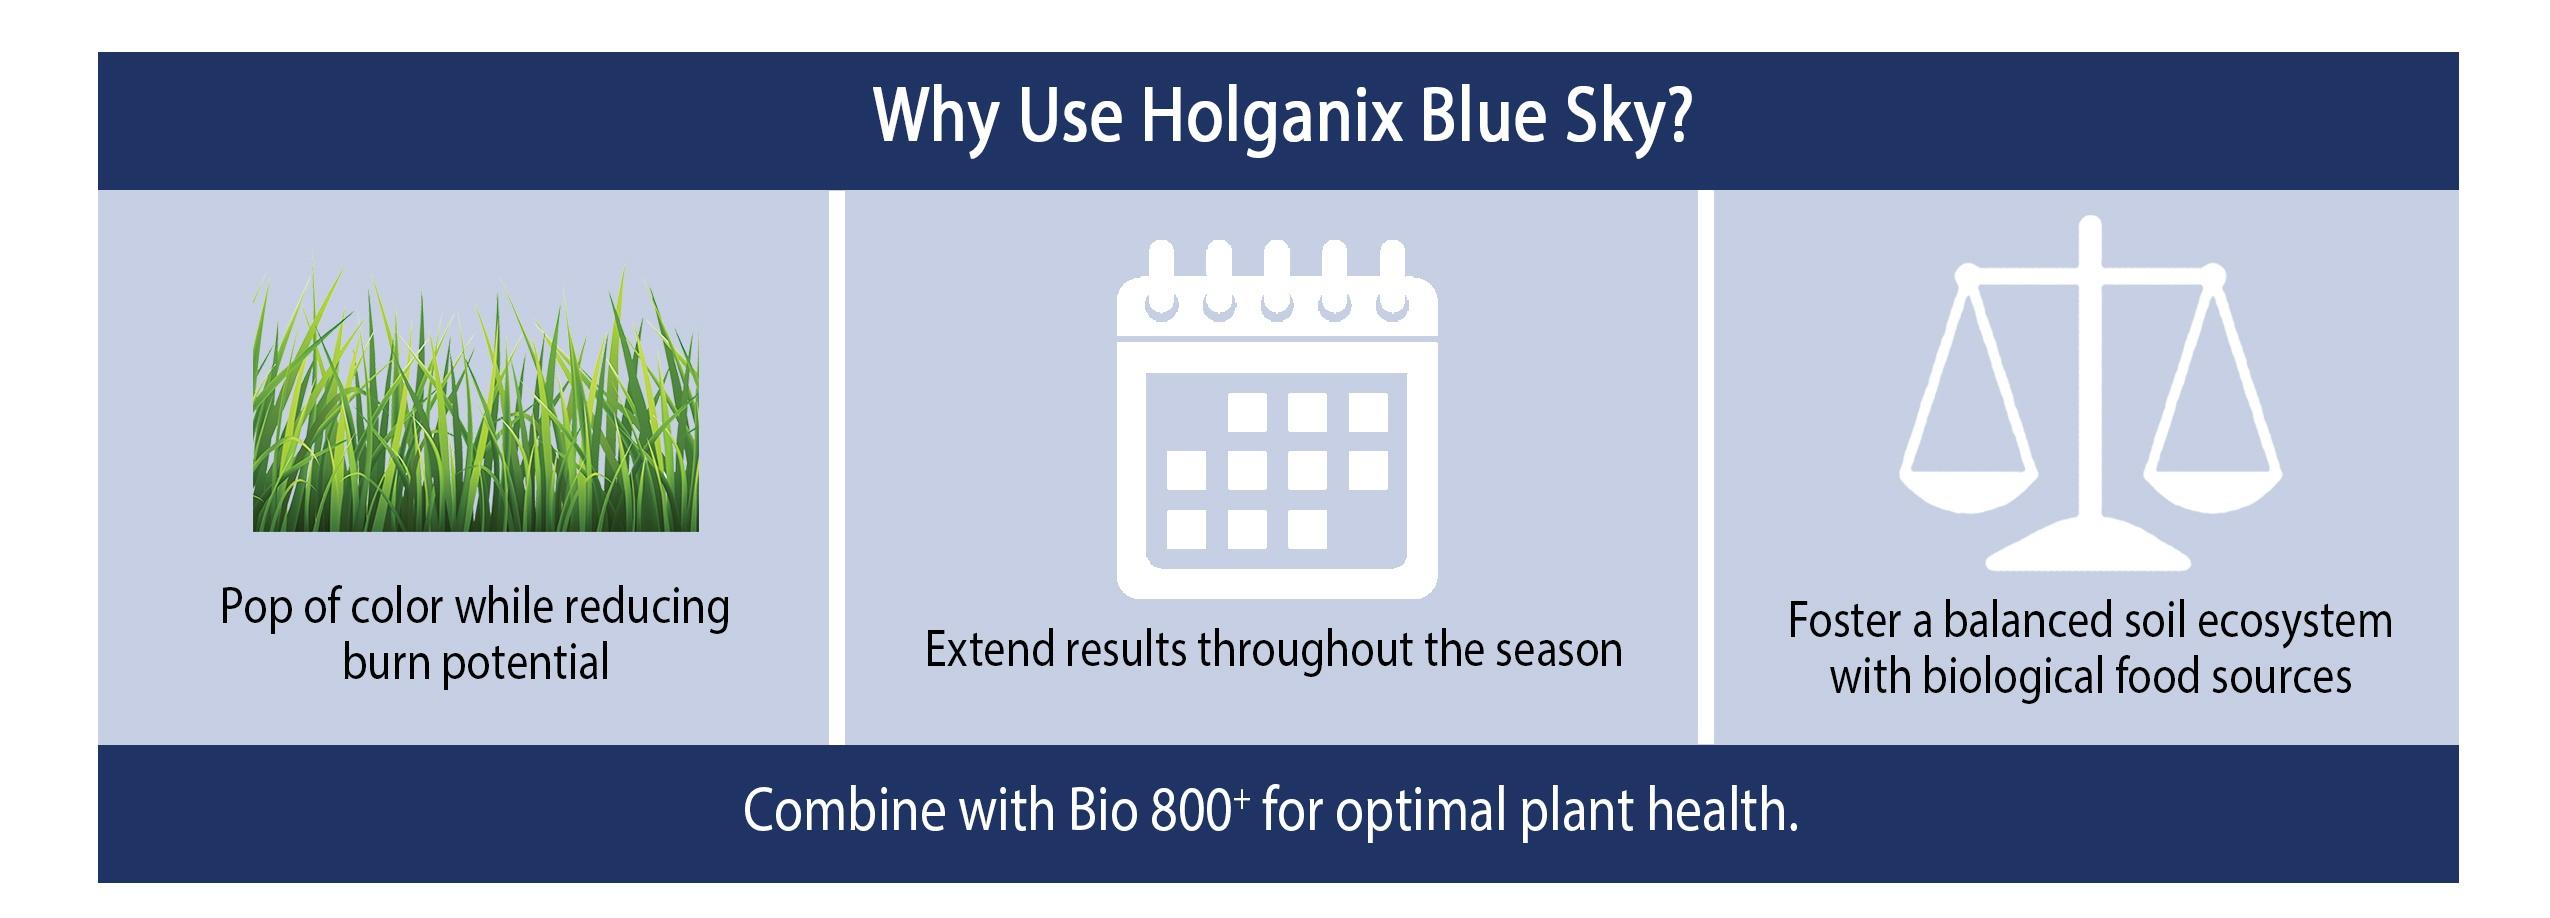 Why use Holganix blue sky.jpg